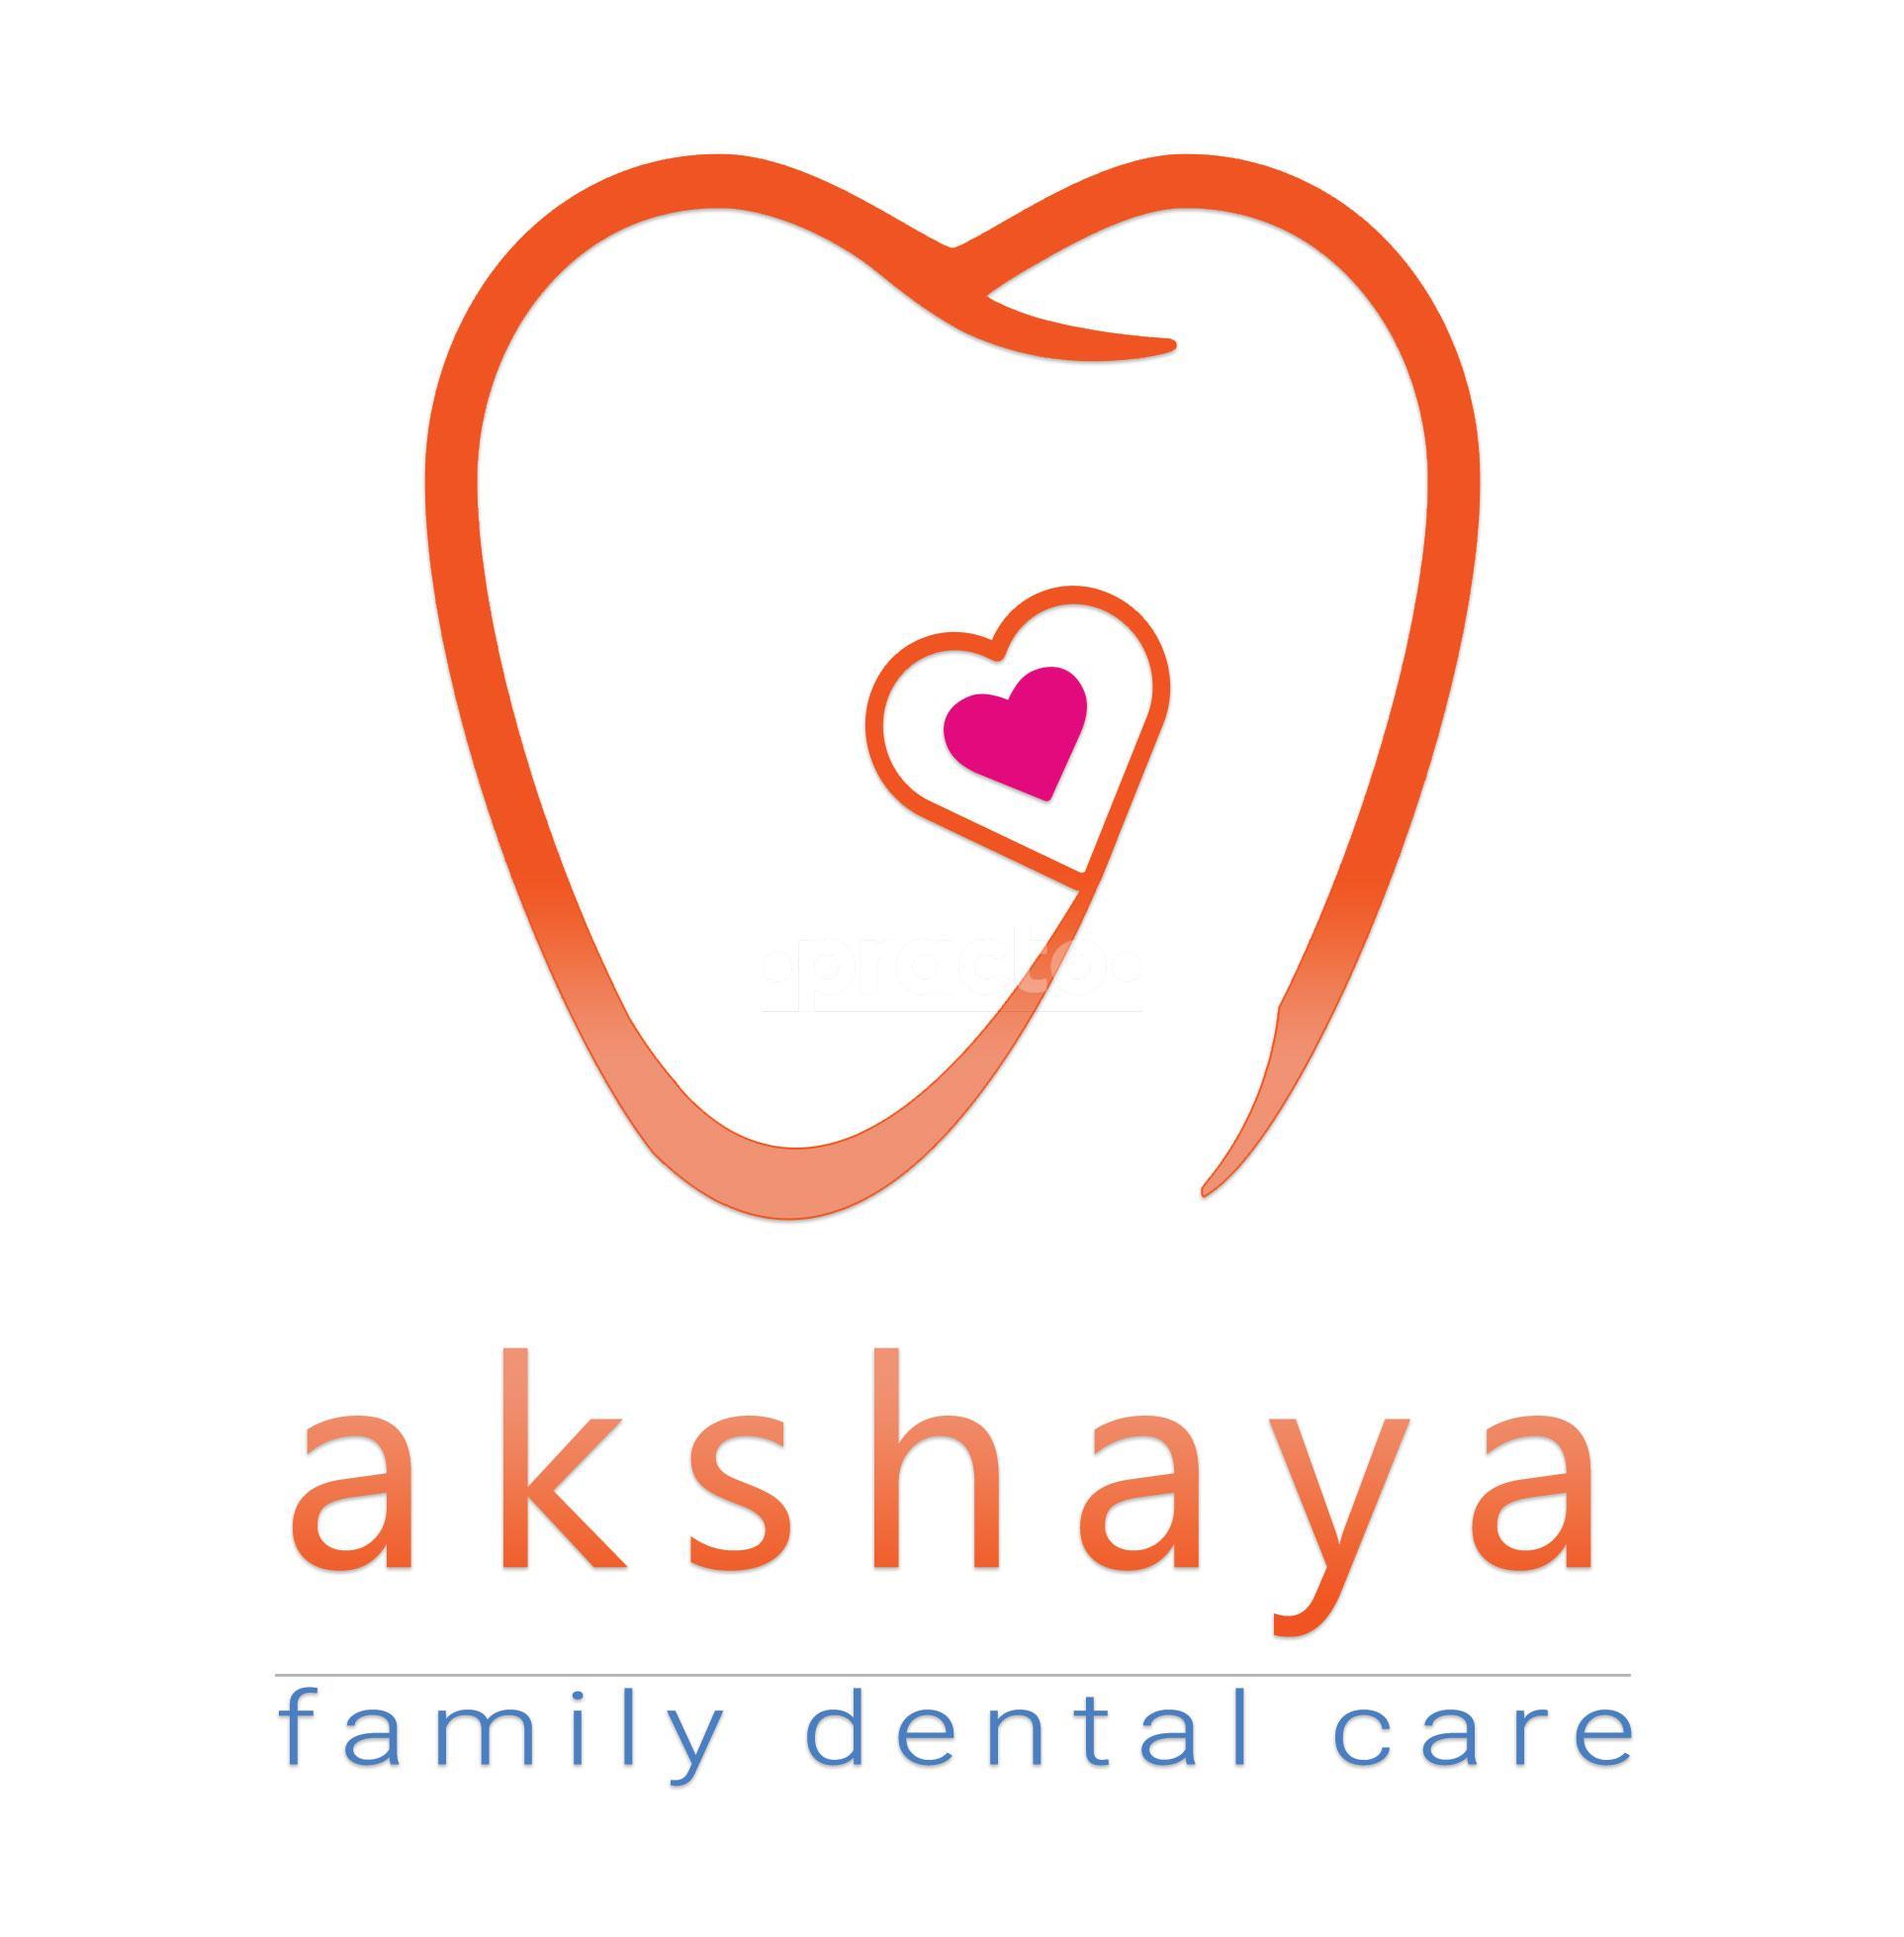 Akshaya Family Dental Care Kedokteran Gigi Kosmetik Clinic In Tenali Guntur Book Appointment View Fees Feedbacks Practo